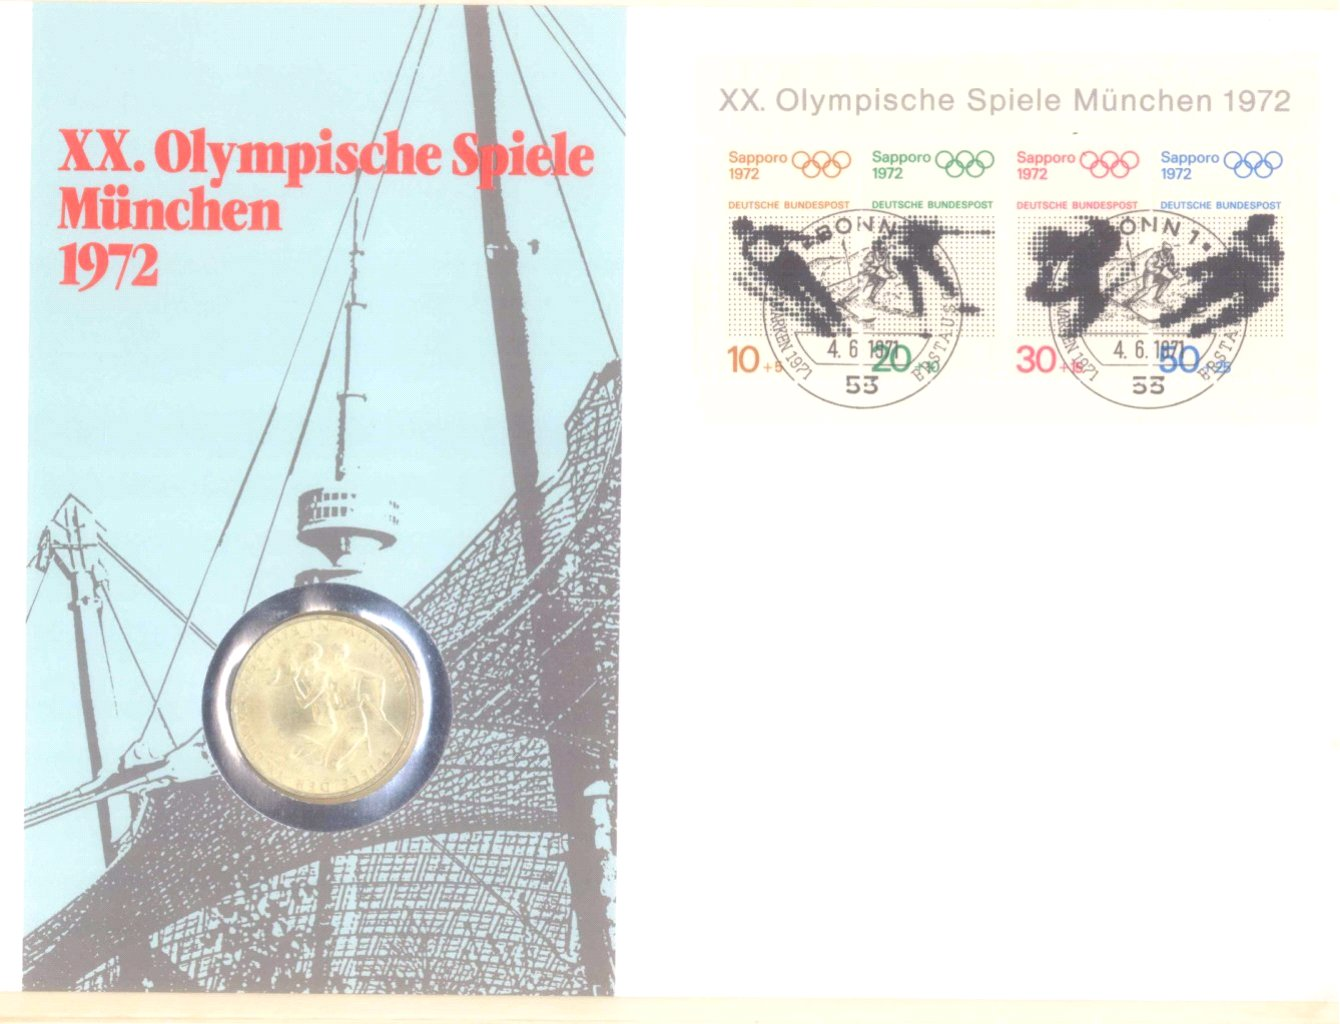 Sammlung Borek Numisbriefe im Ringbinder-17